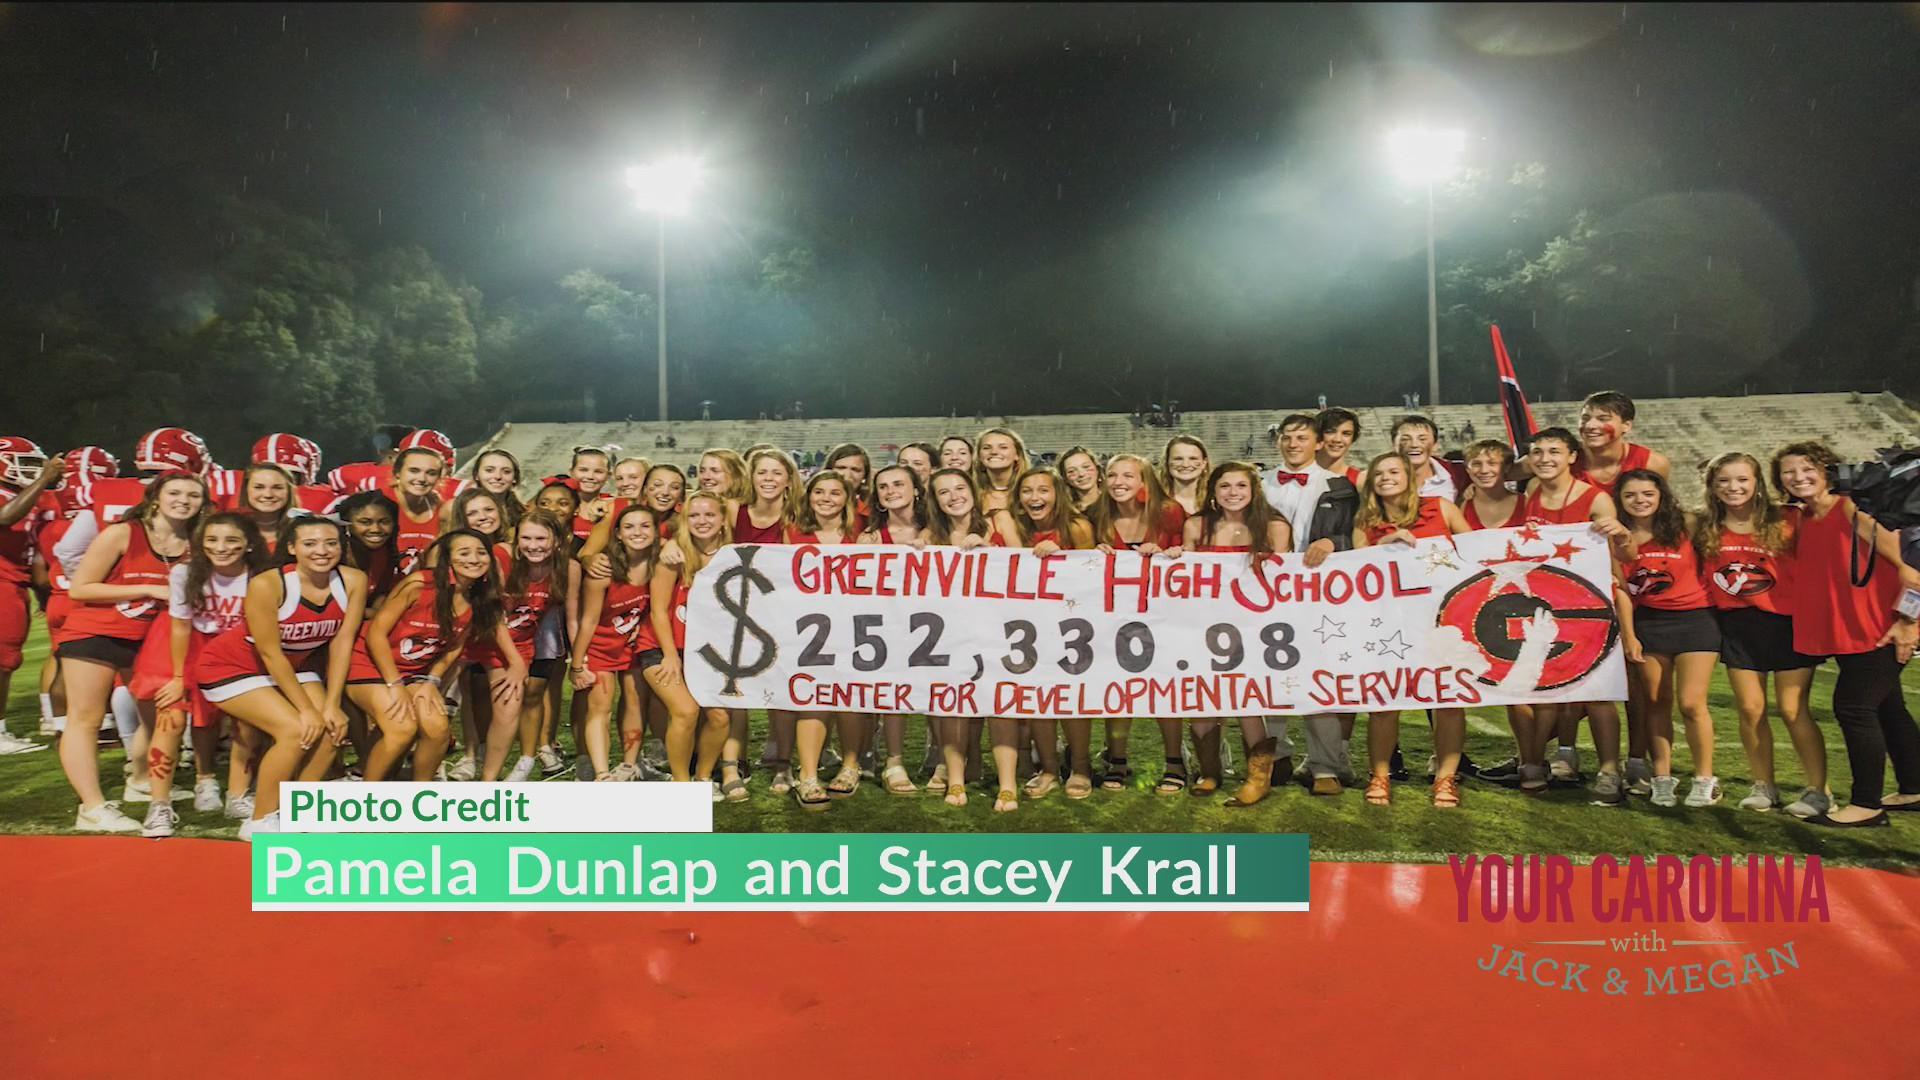 Good News - Greenville High Raises Record Amount During Spriit Week